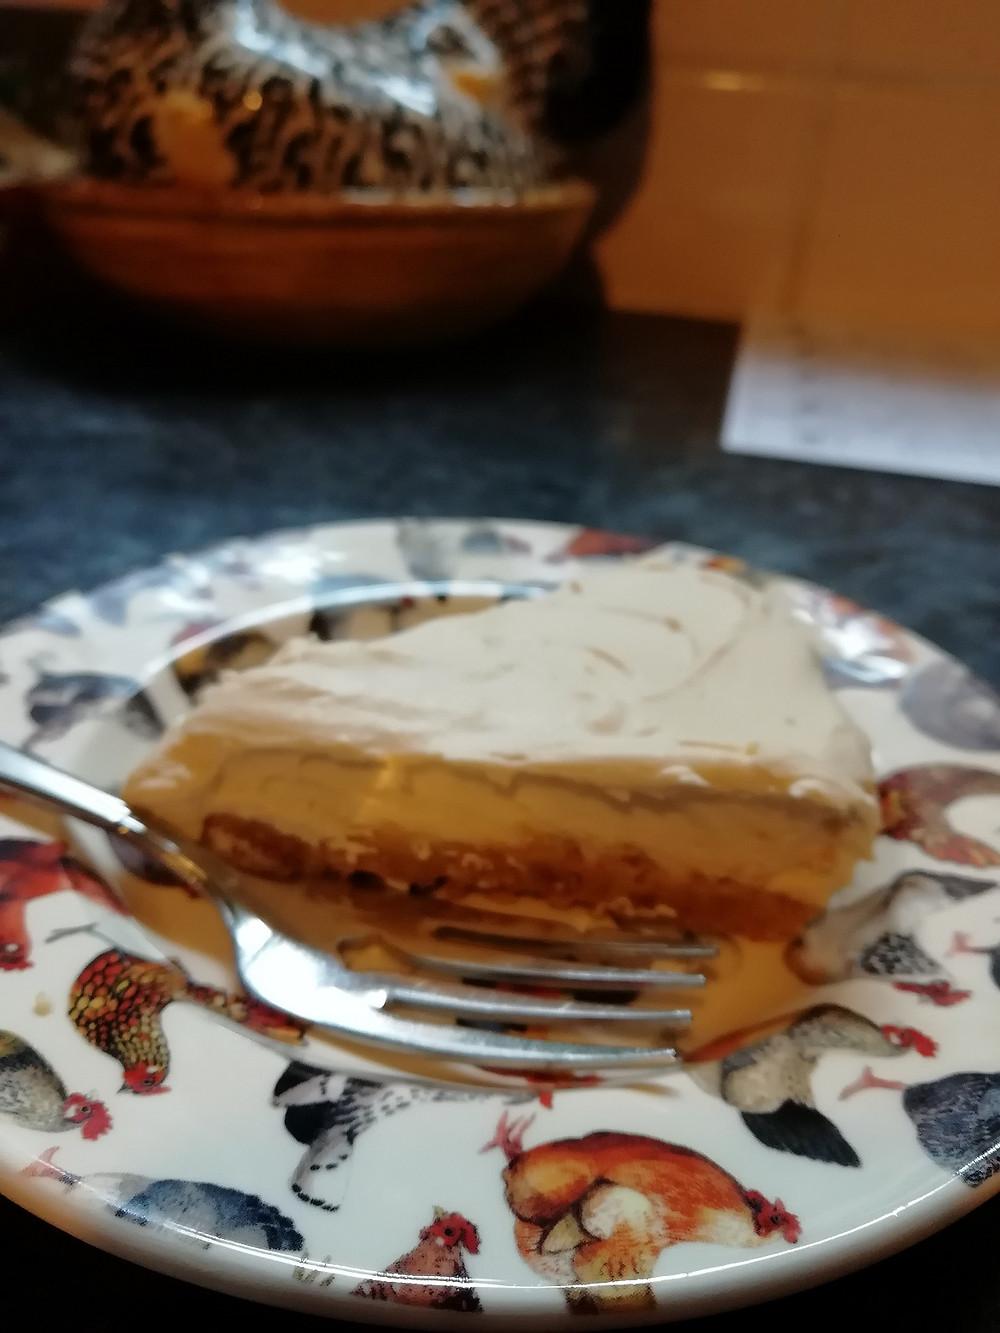 Slice of coffee cheesecake